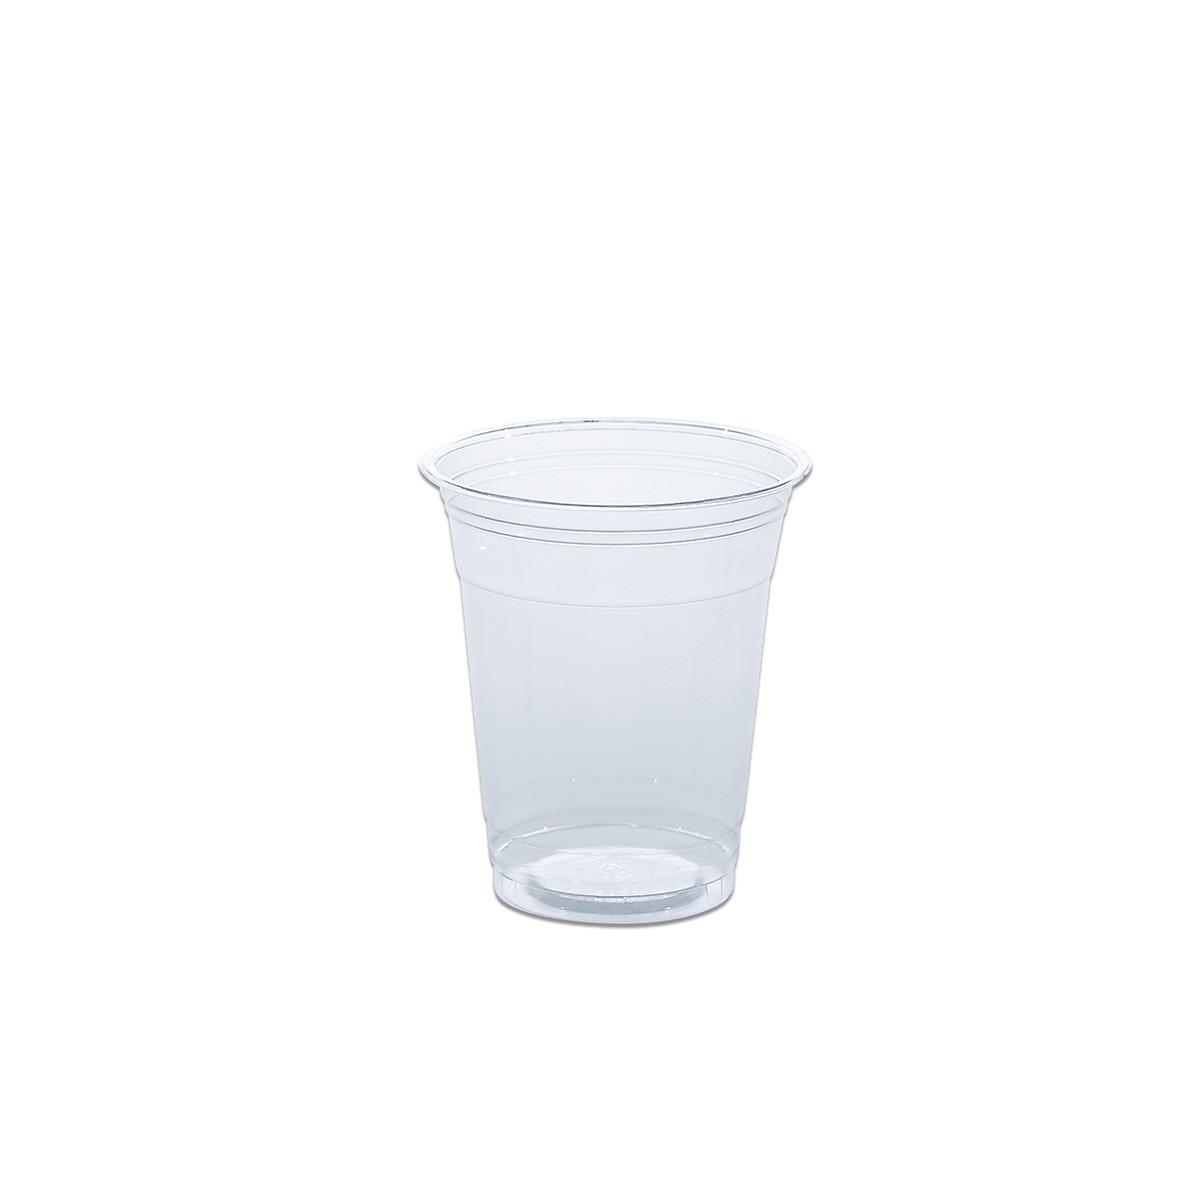 Clear Extra HD Plastic Cups 8oz - PET | 50pcsx20pkts